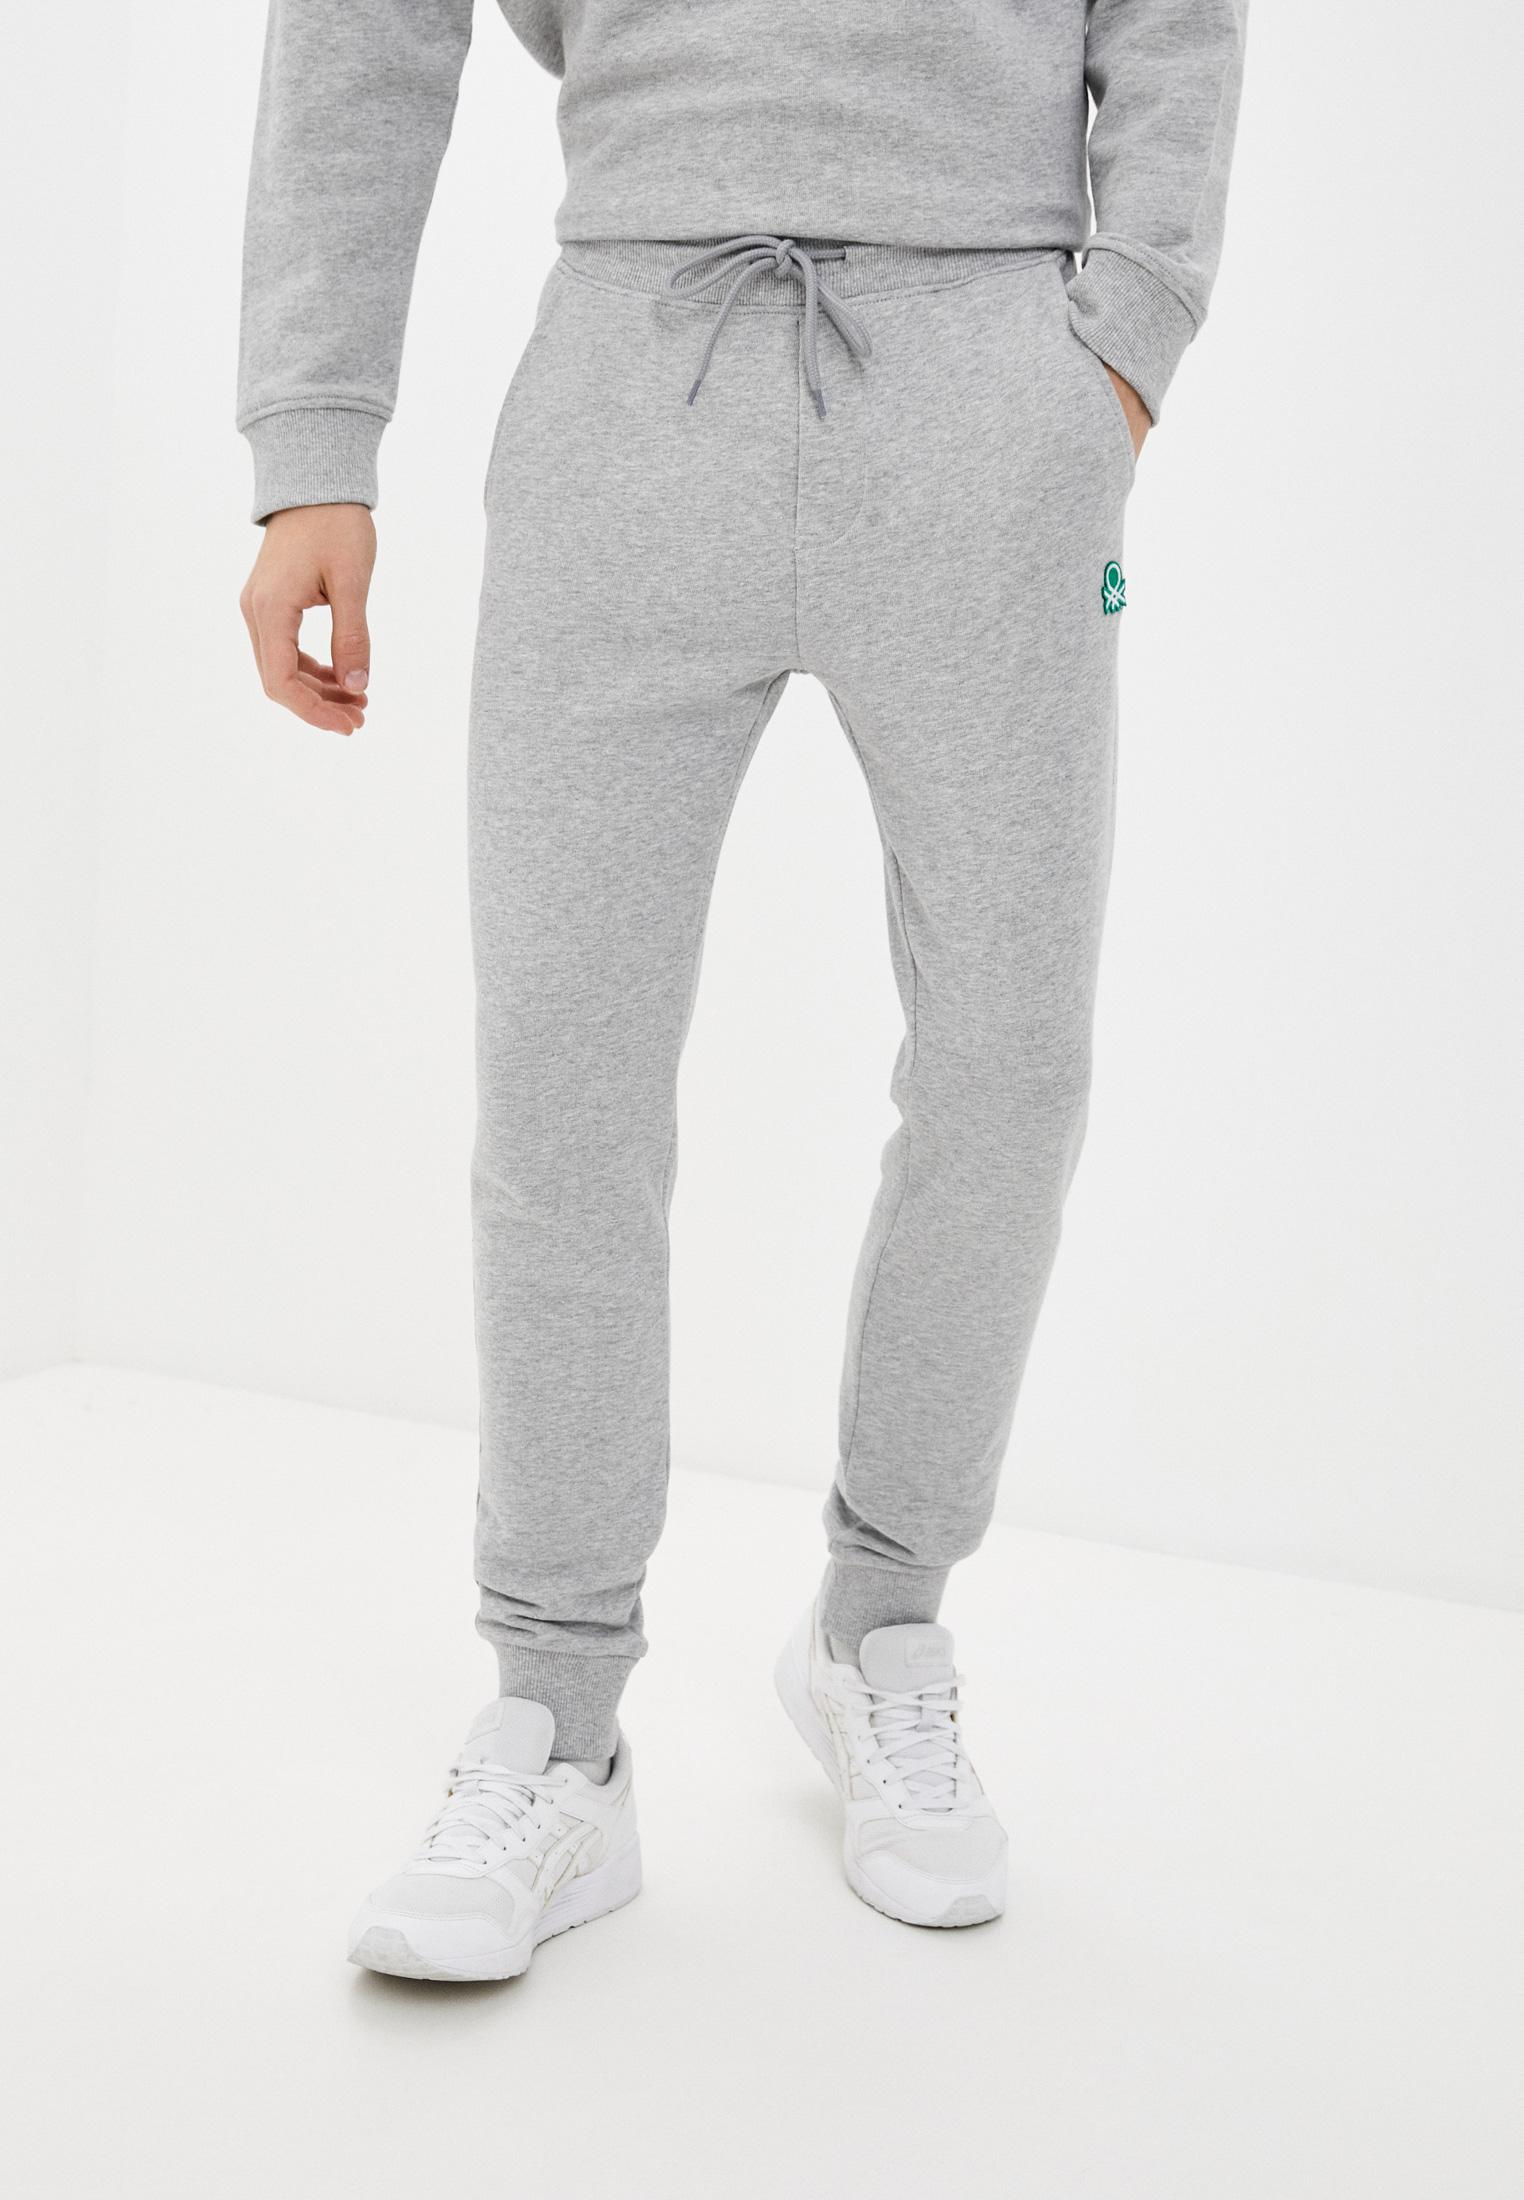 Мужские спортивные брюки United Colors of Benetton (Юнайтед Колорс оф Бенеттон) 3J68P0503